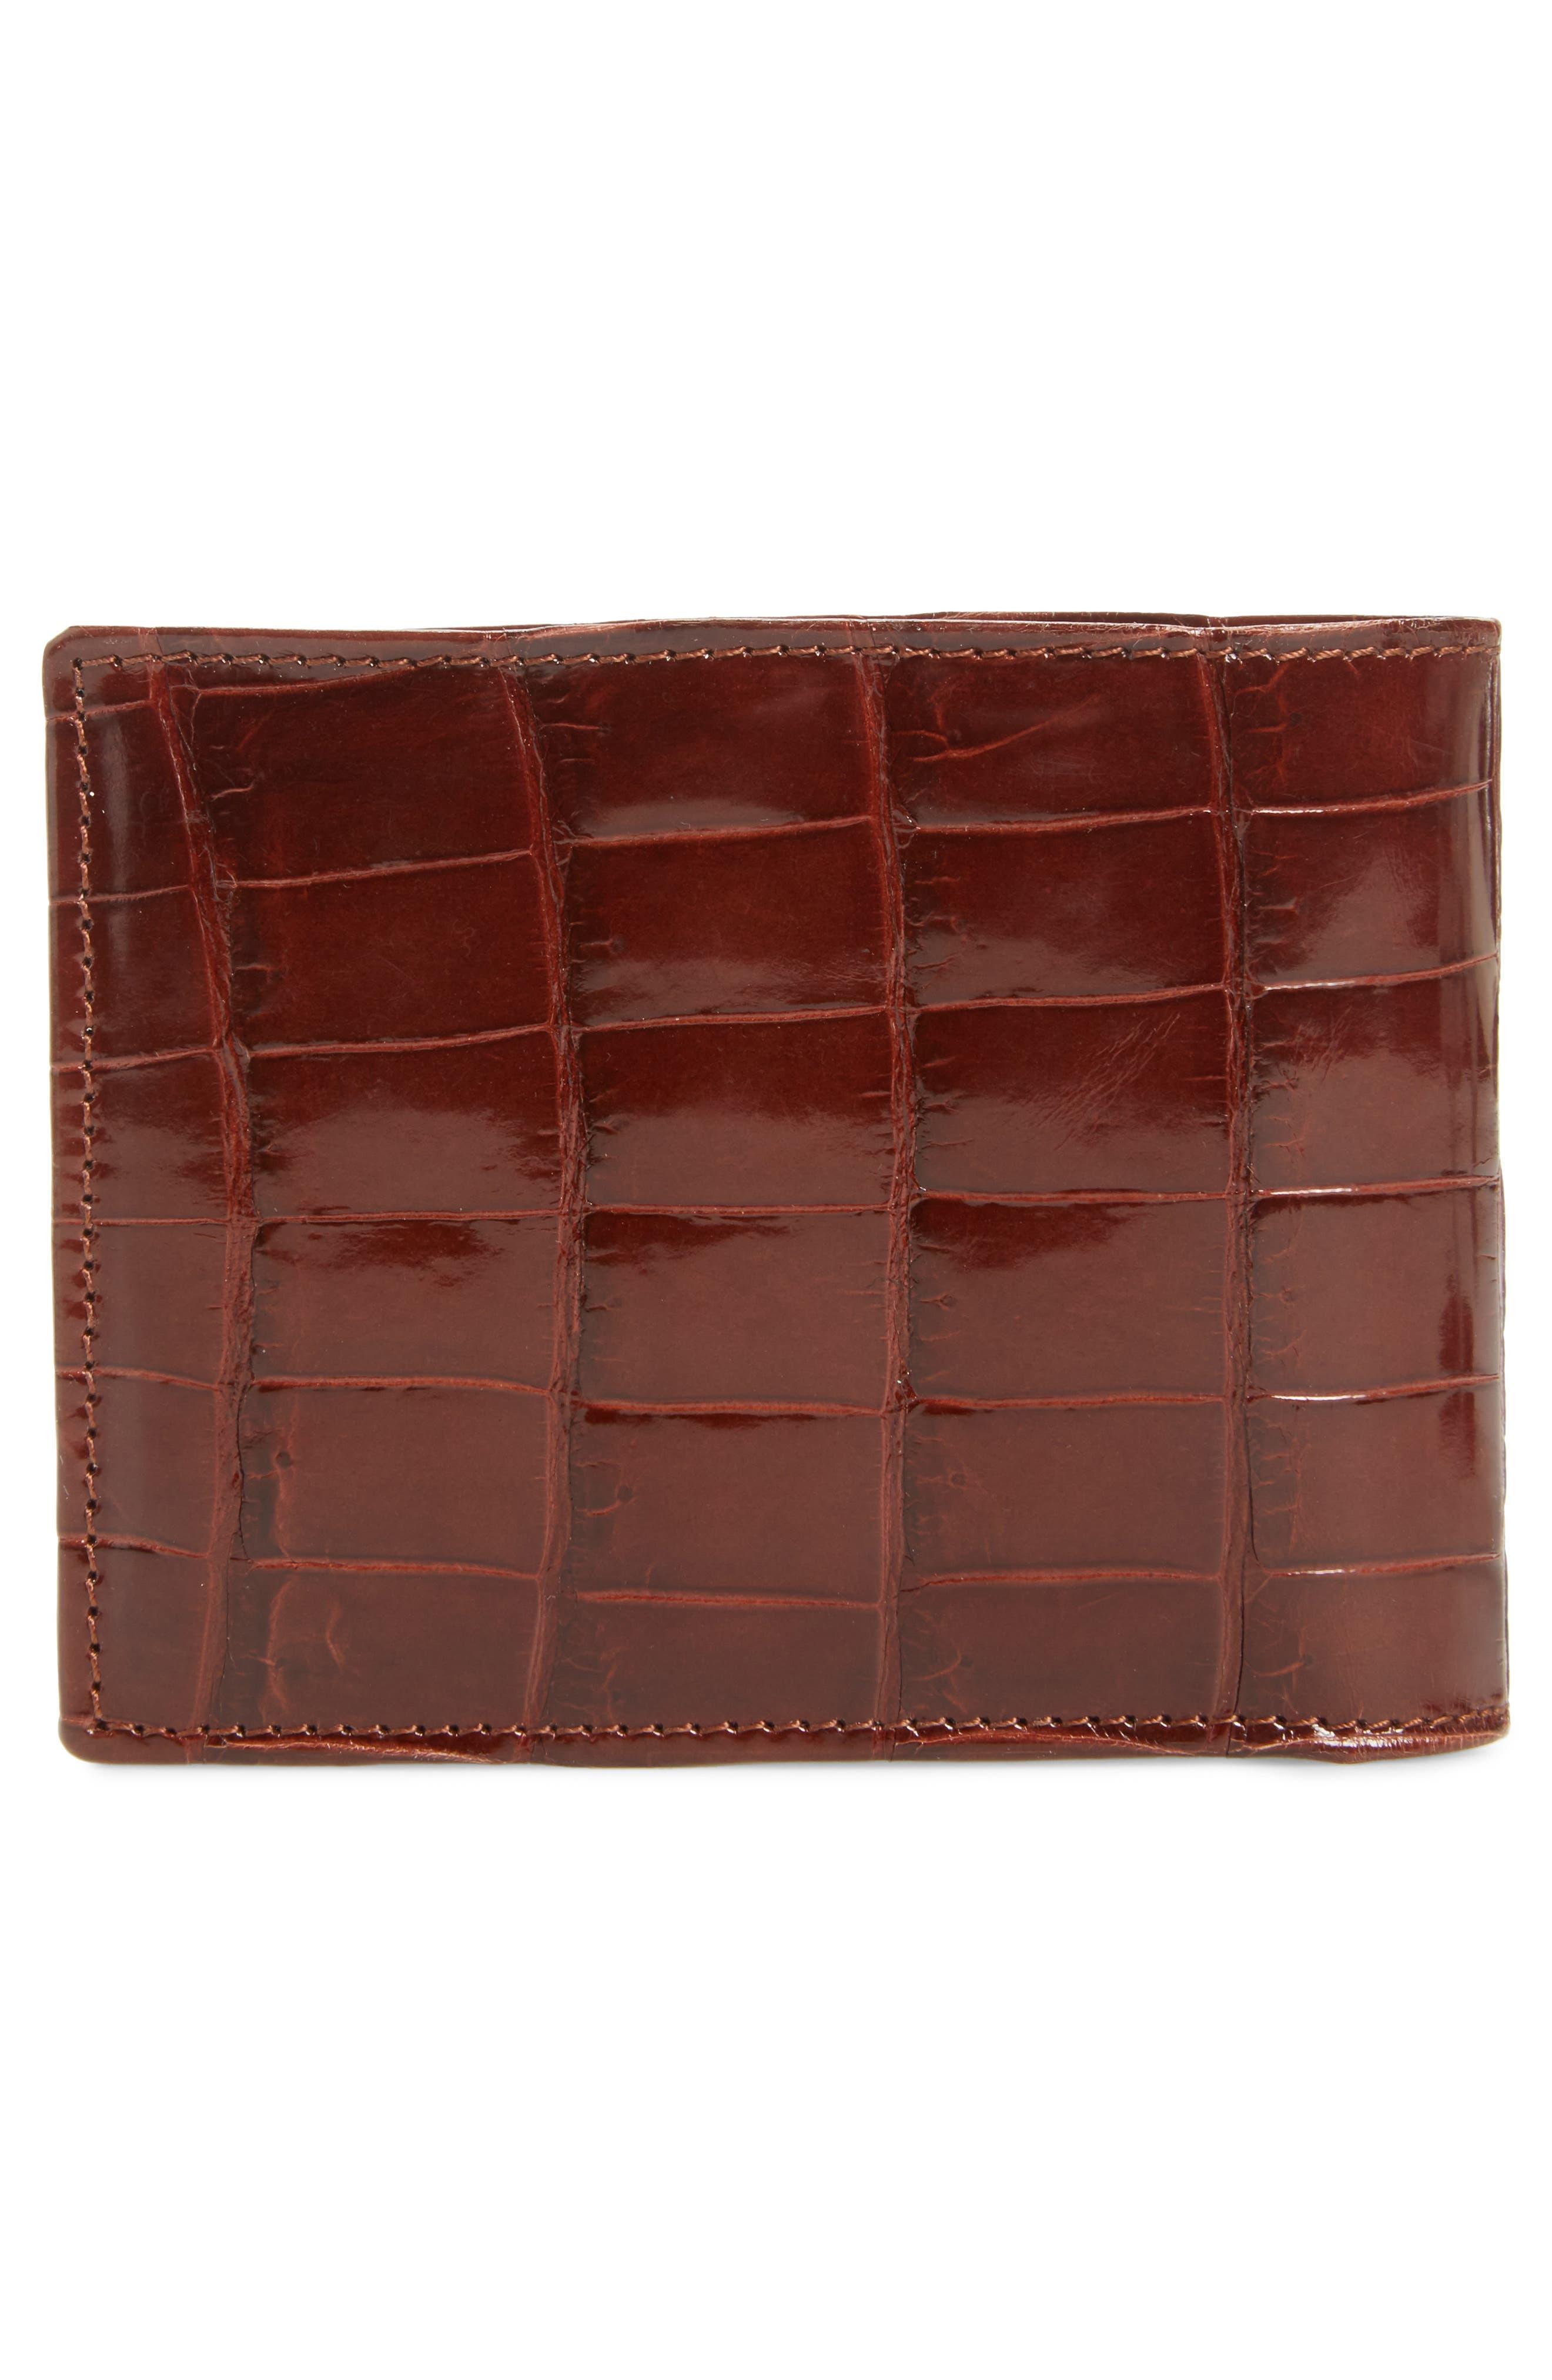 Alligator Leather Bifold Wallet,                             Alternate thumbnail 3, color,                             Sport